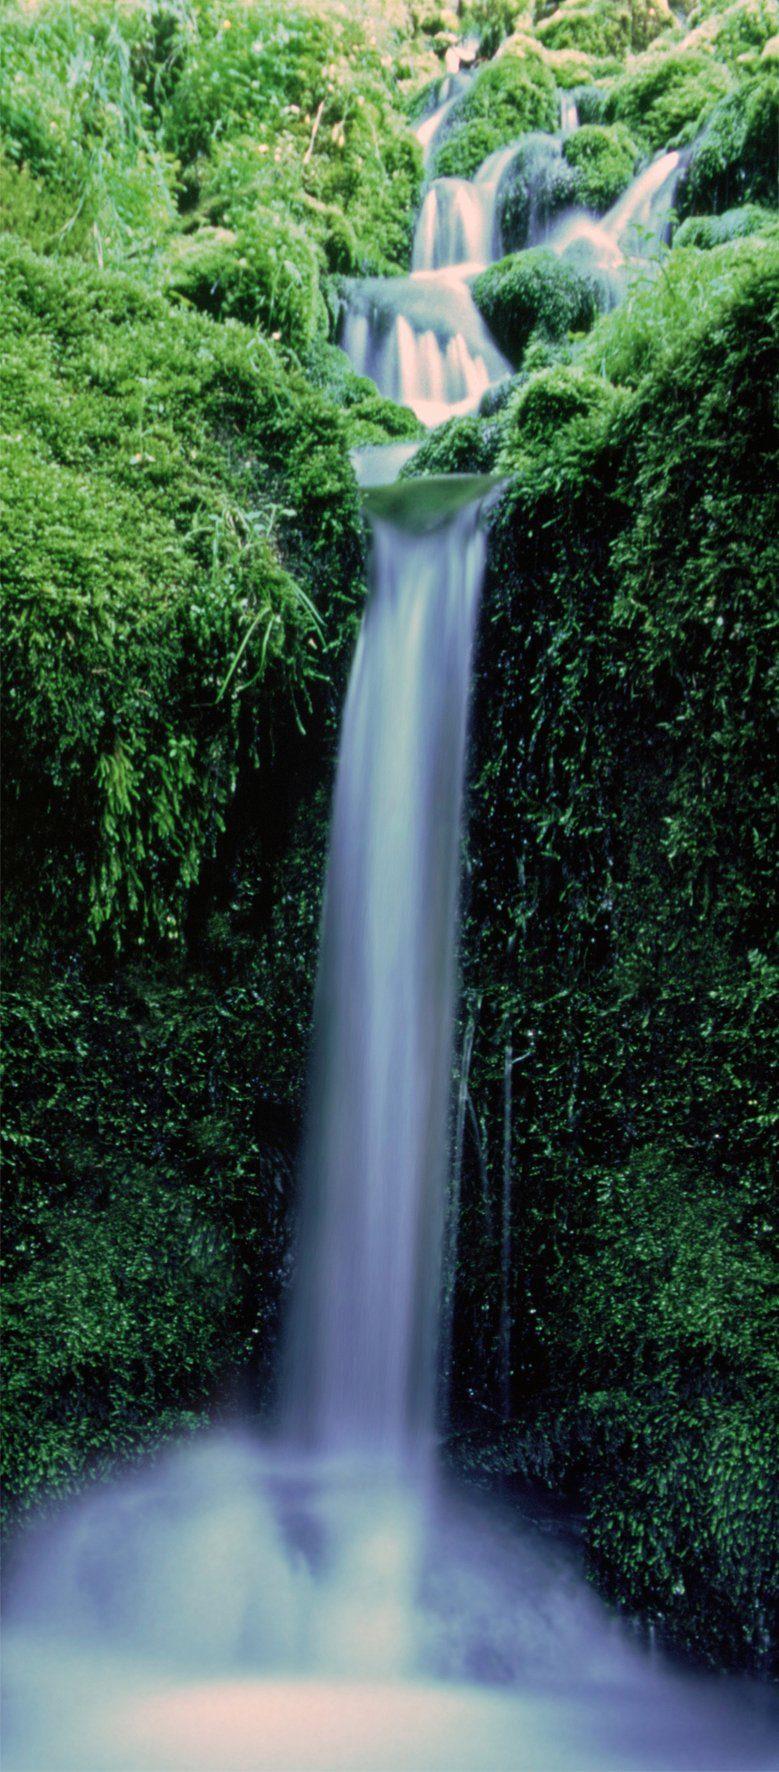 PAPERMOON Fototapete »Zaragoza Falls - Türtapete«, Vlies, 2 Bahnen, 90 x 200 cm